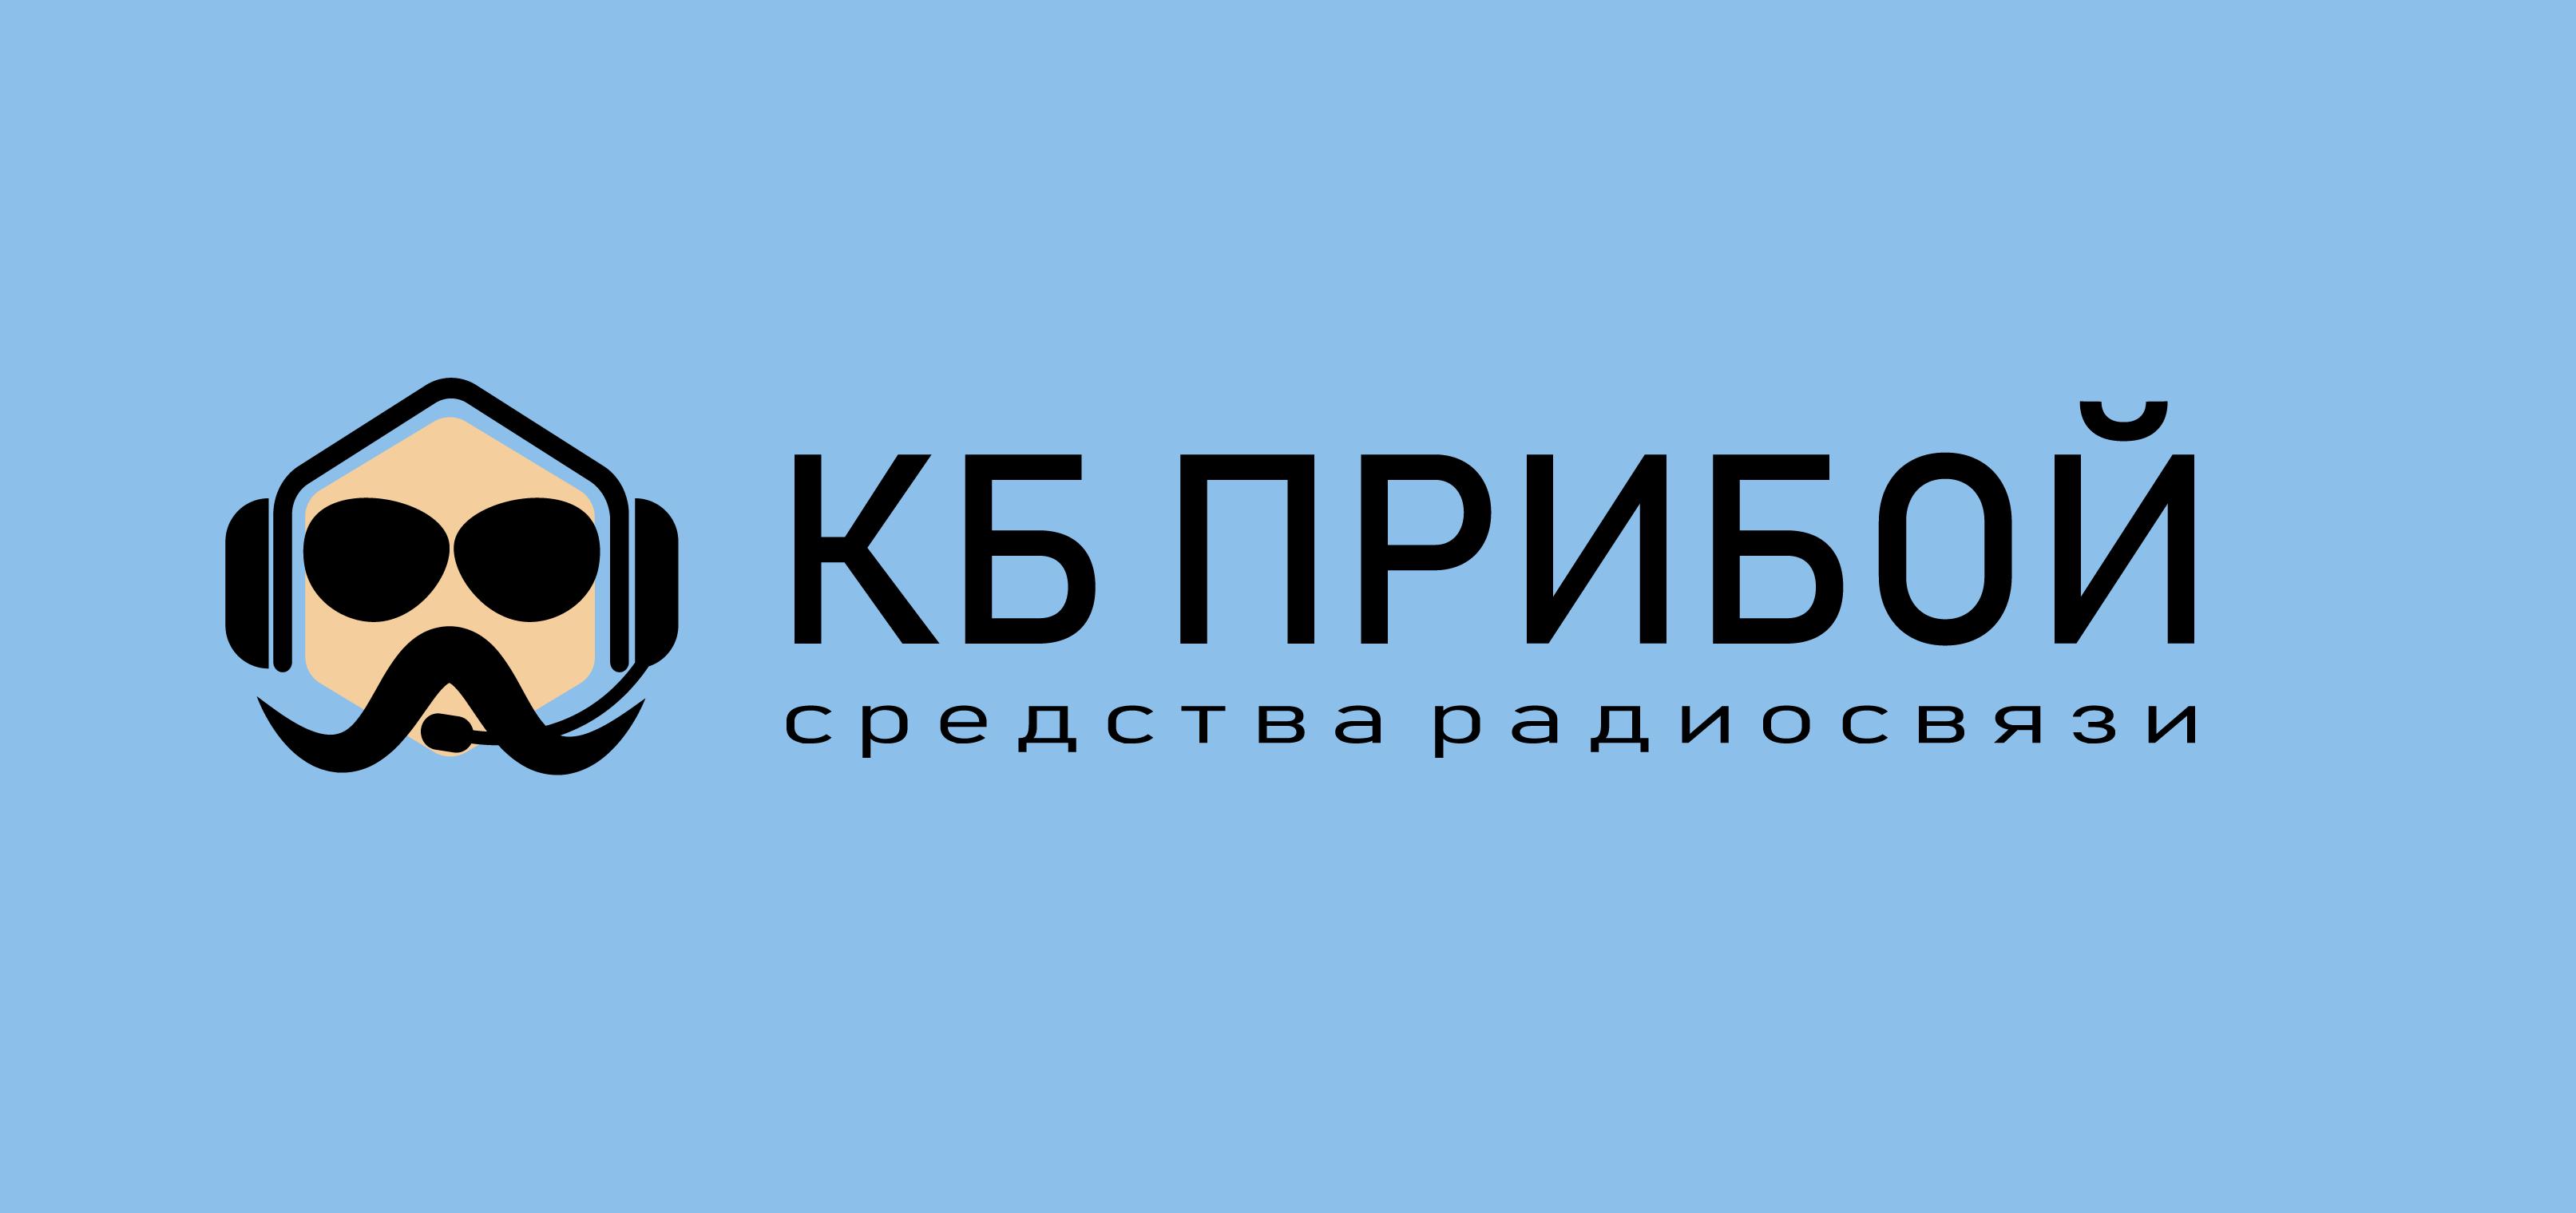 Разработка логотипа и фирменного стиля для КБ Прибой фото f_8745b29737321698.png